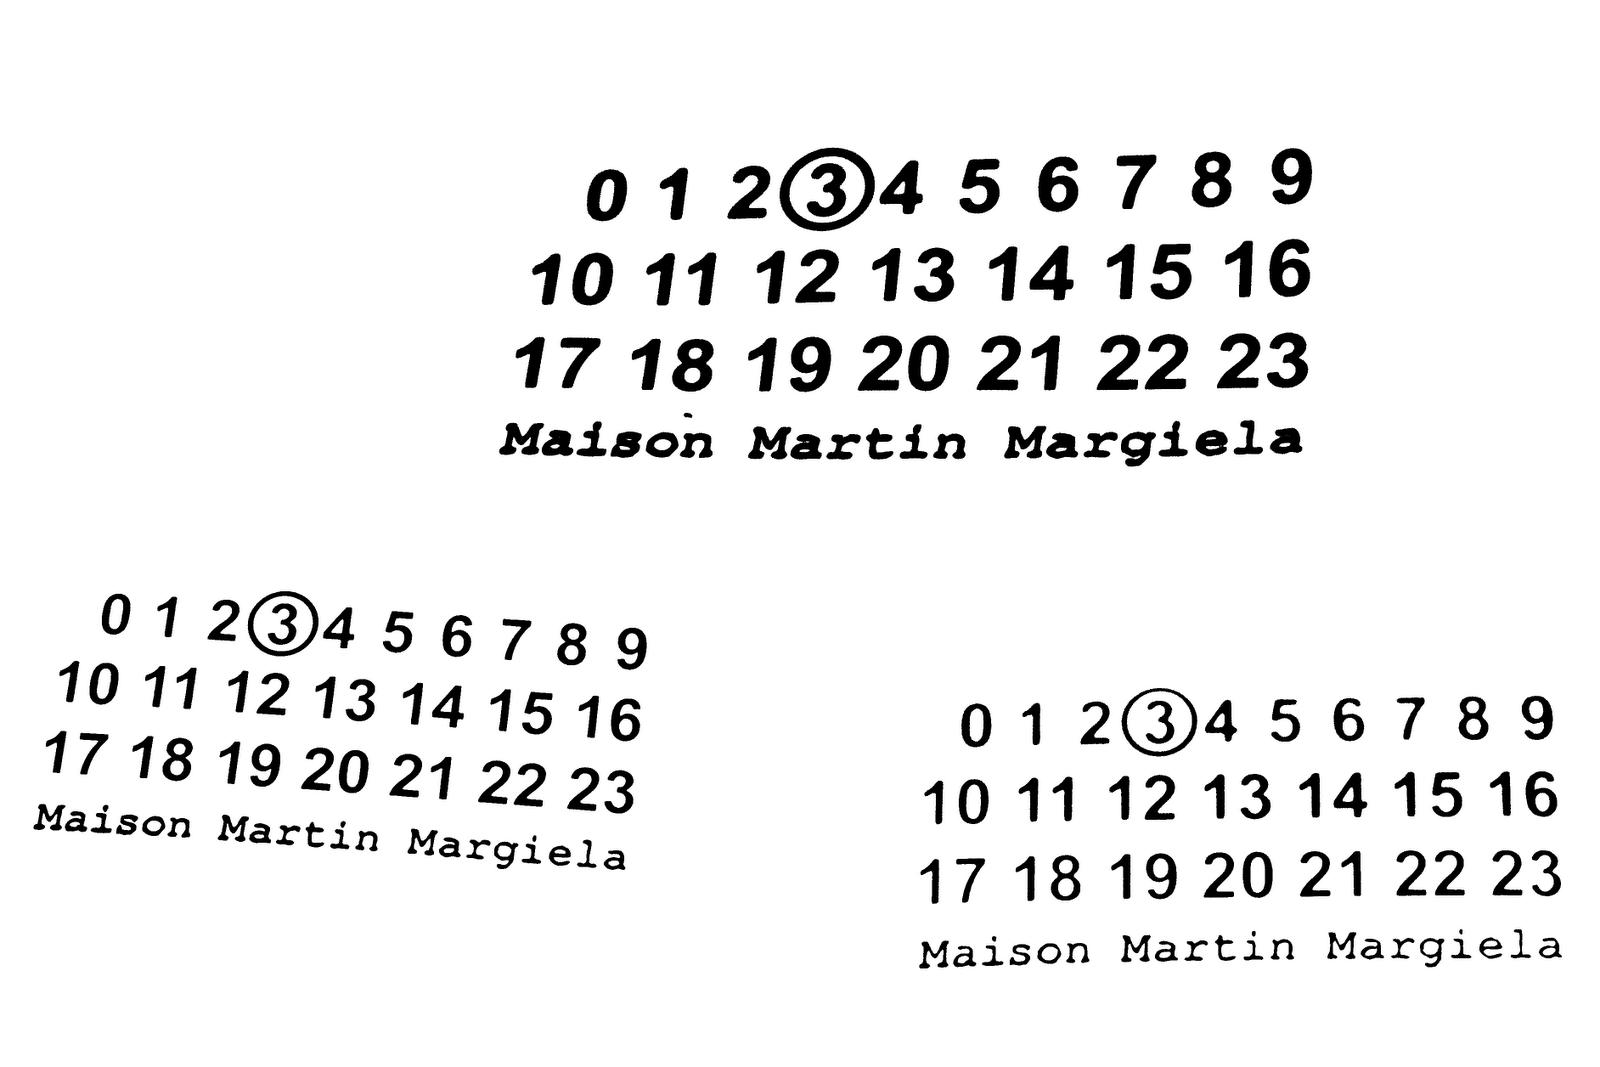 Maison Martin Margiela logos